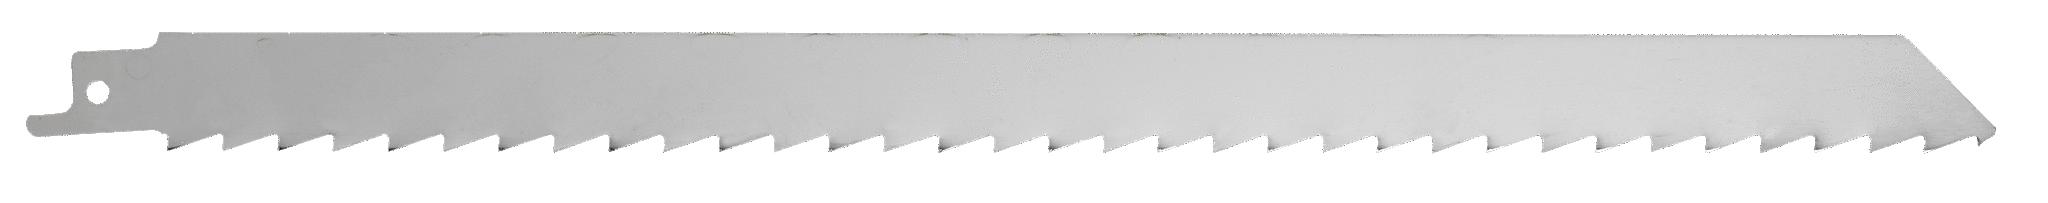 3844-300-3-MEAT-1P 3 ZPZ Bahco Säbelsägeblatt für Fleisch 300mm